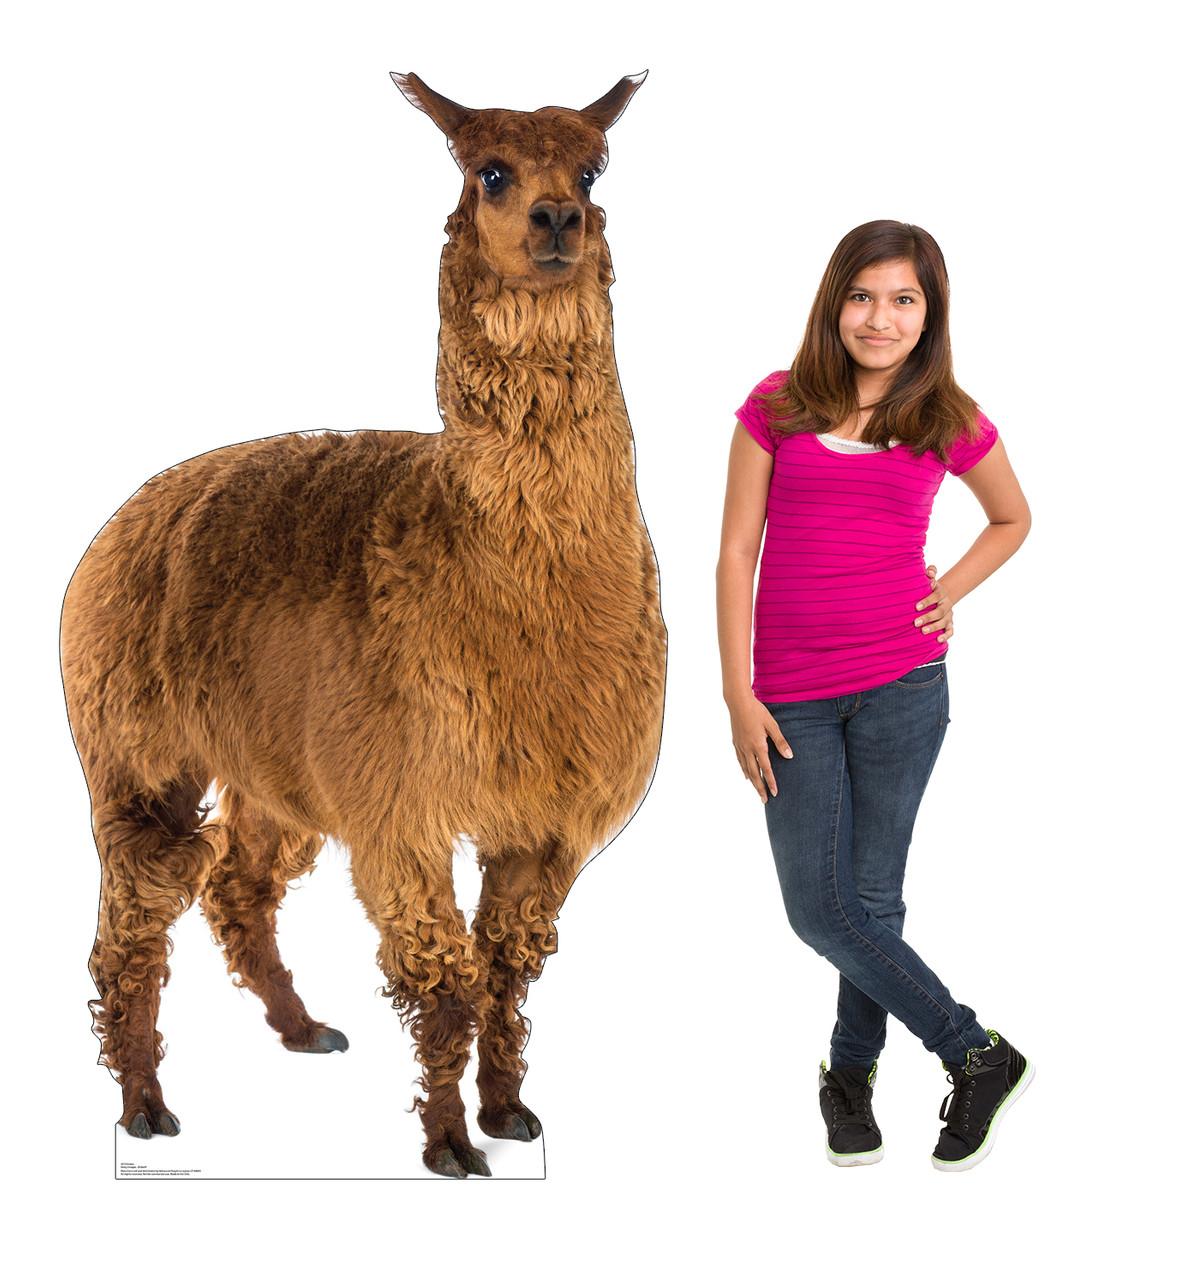 Life-size cardboard standee of a Llama Lifesize